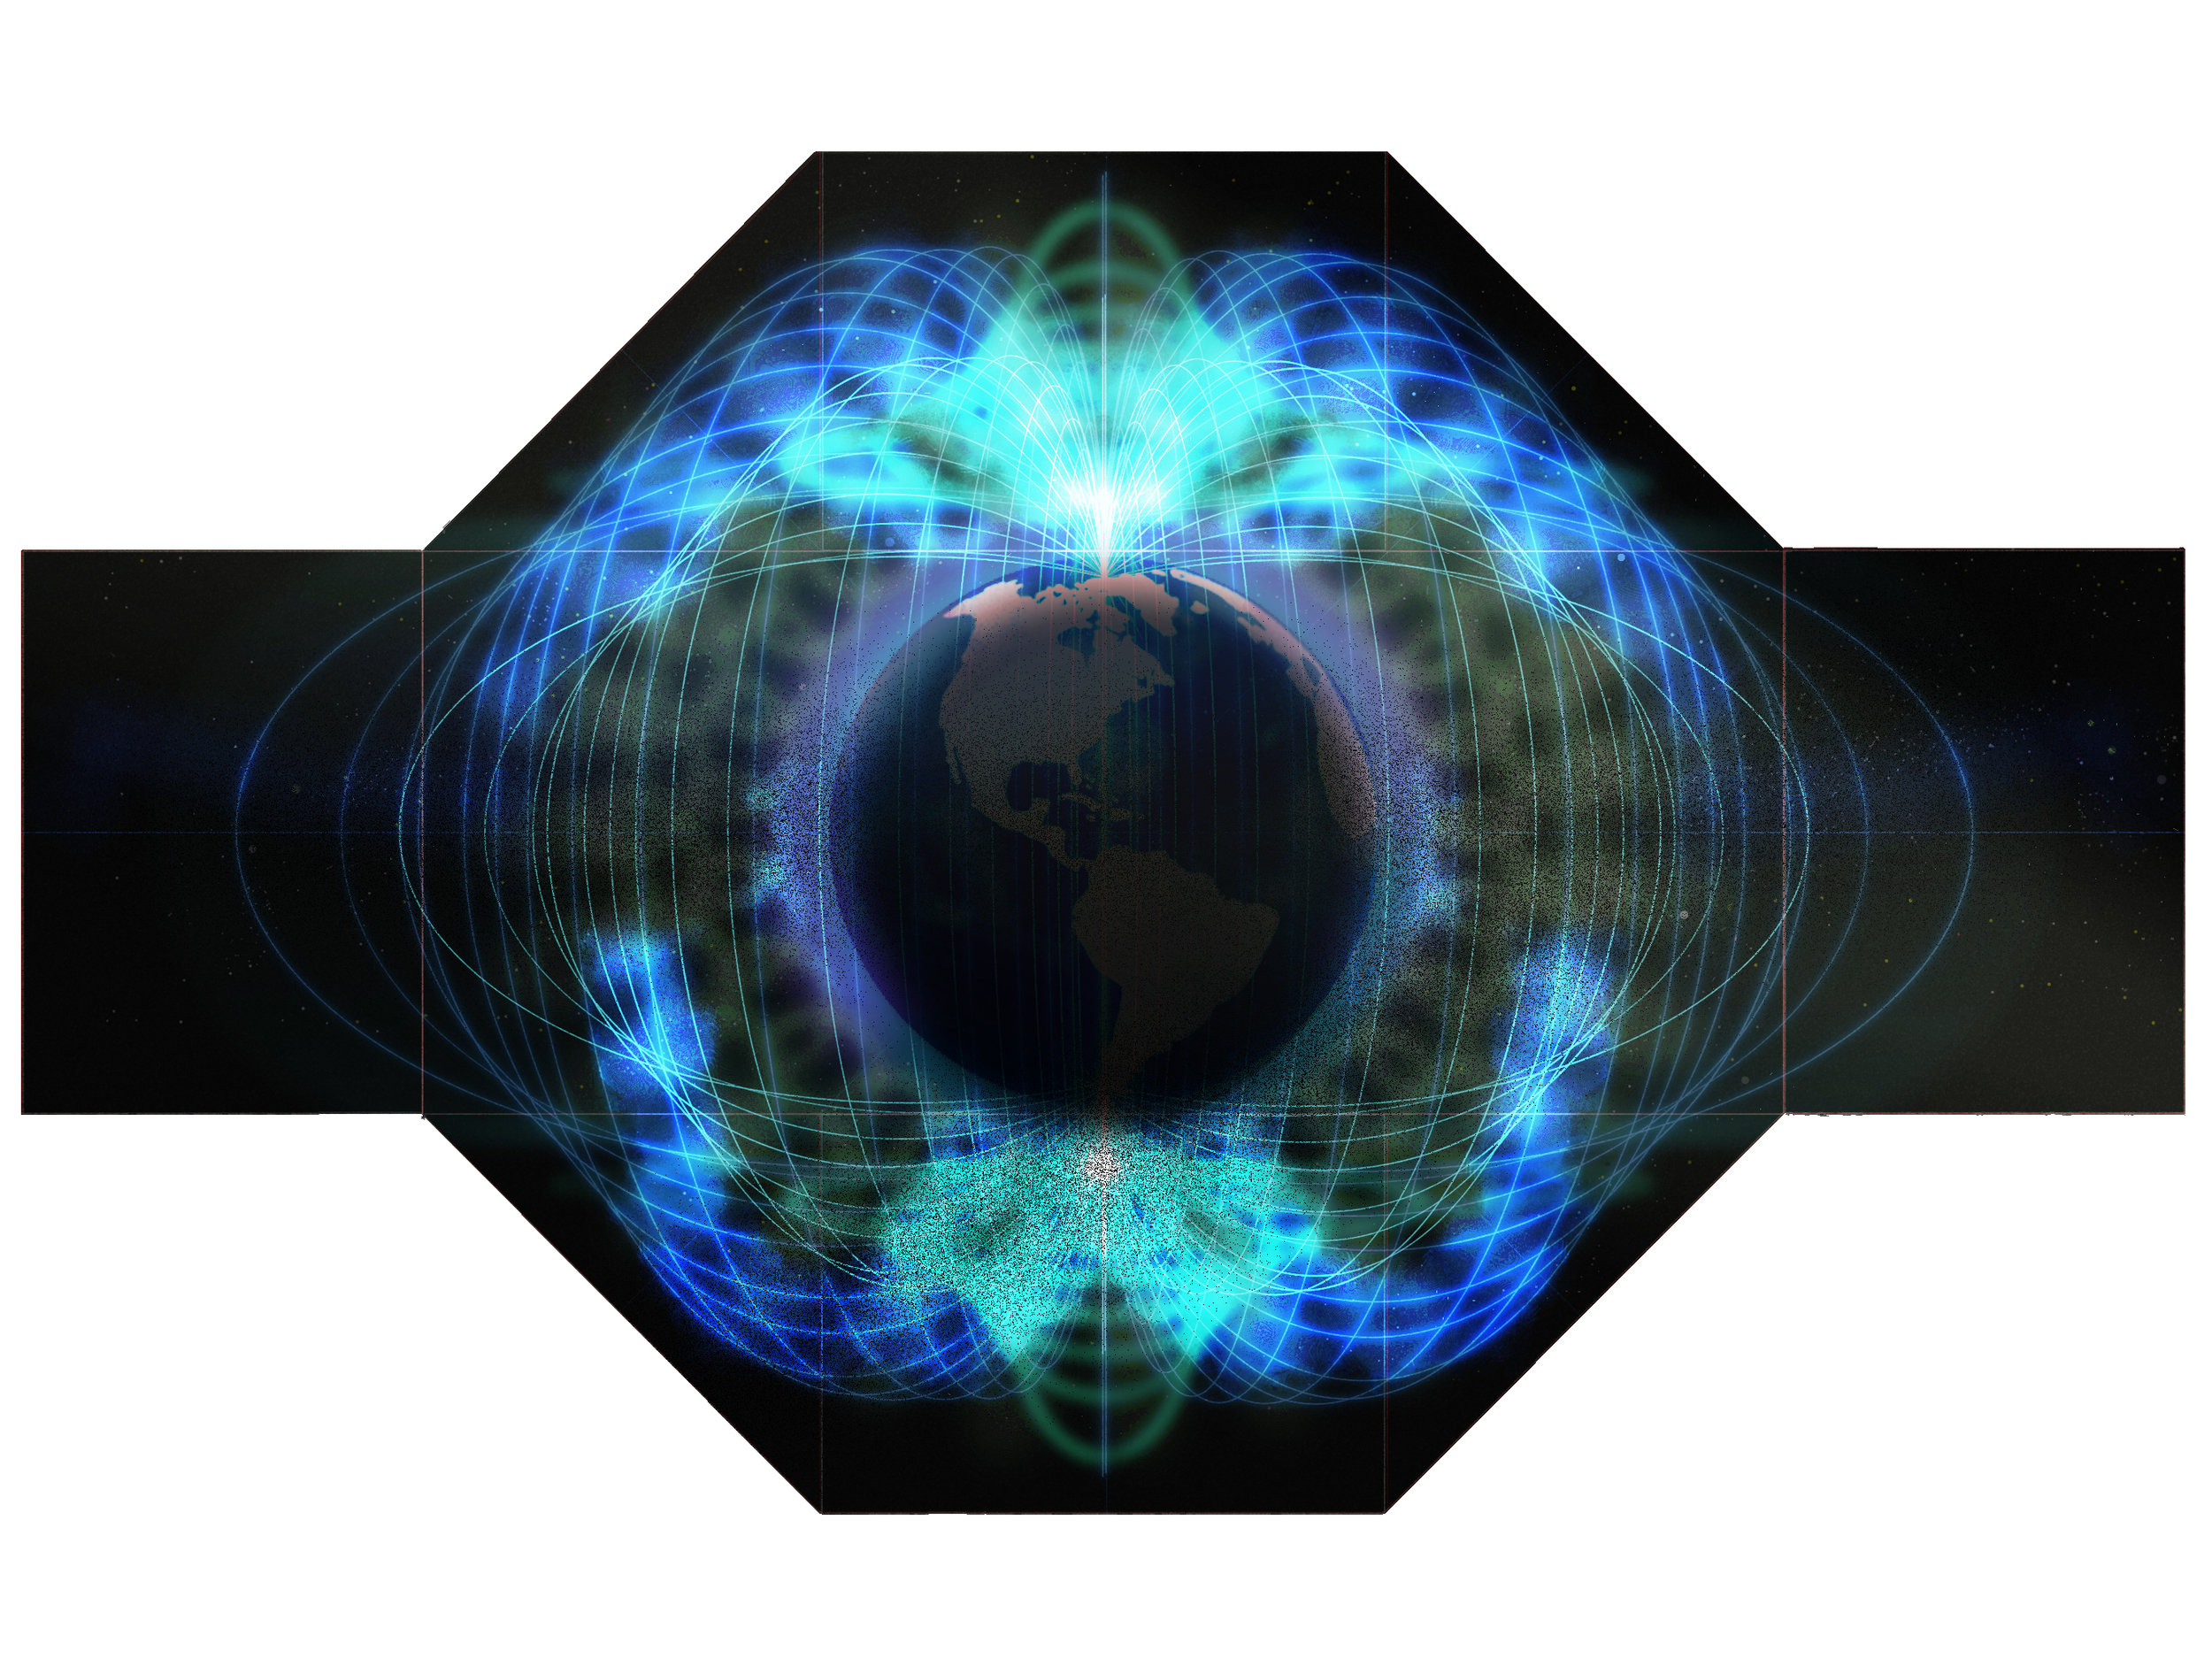 CaseStudySpheres_06.jpg